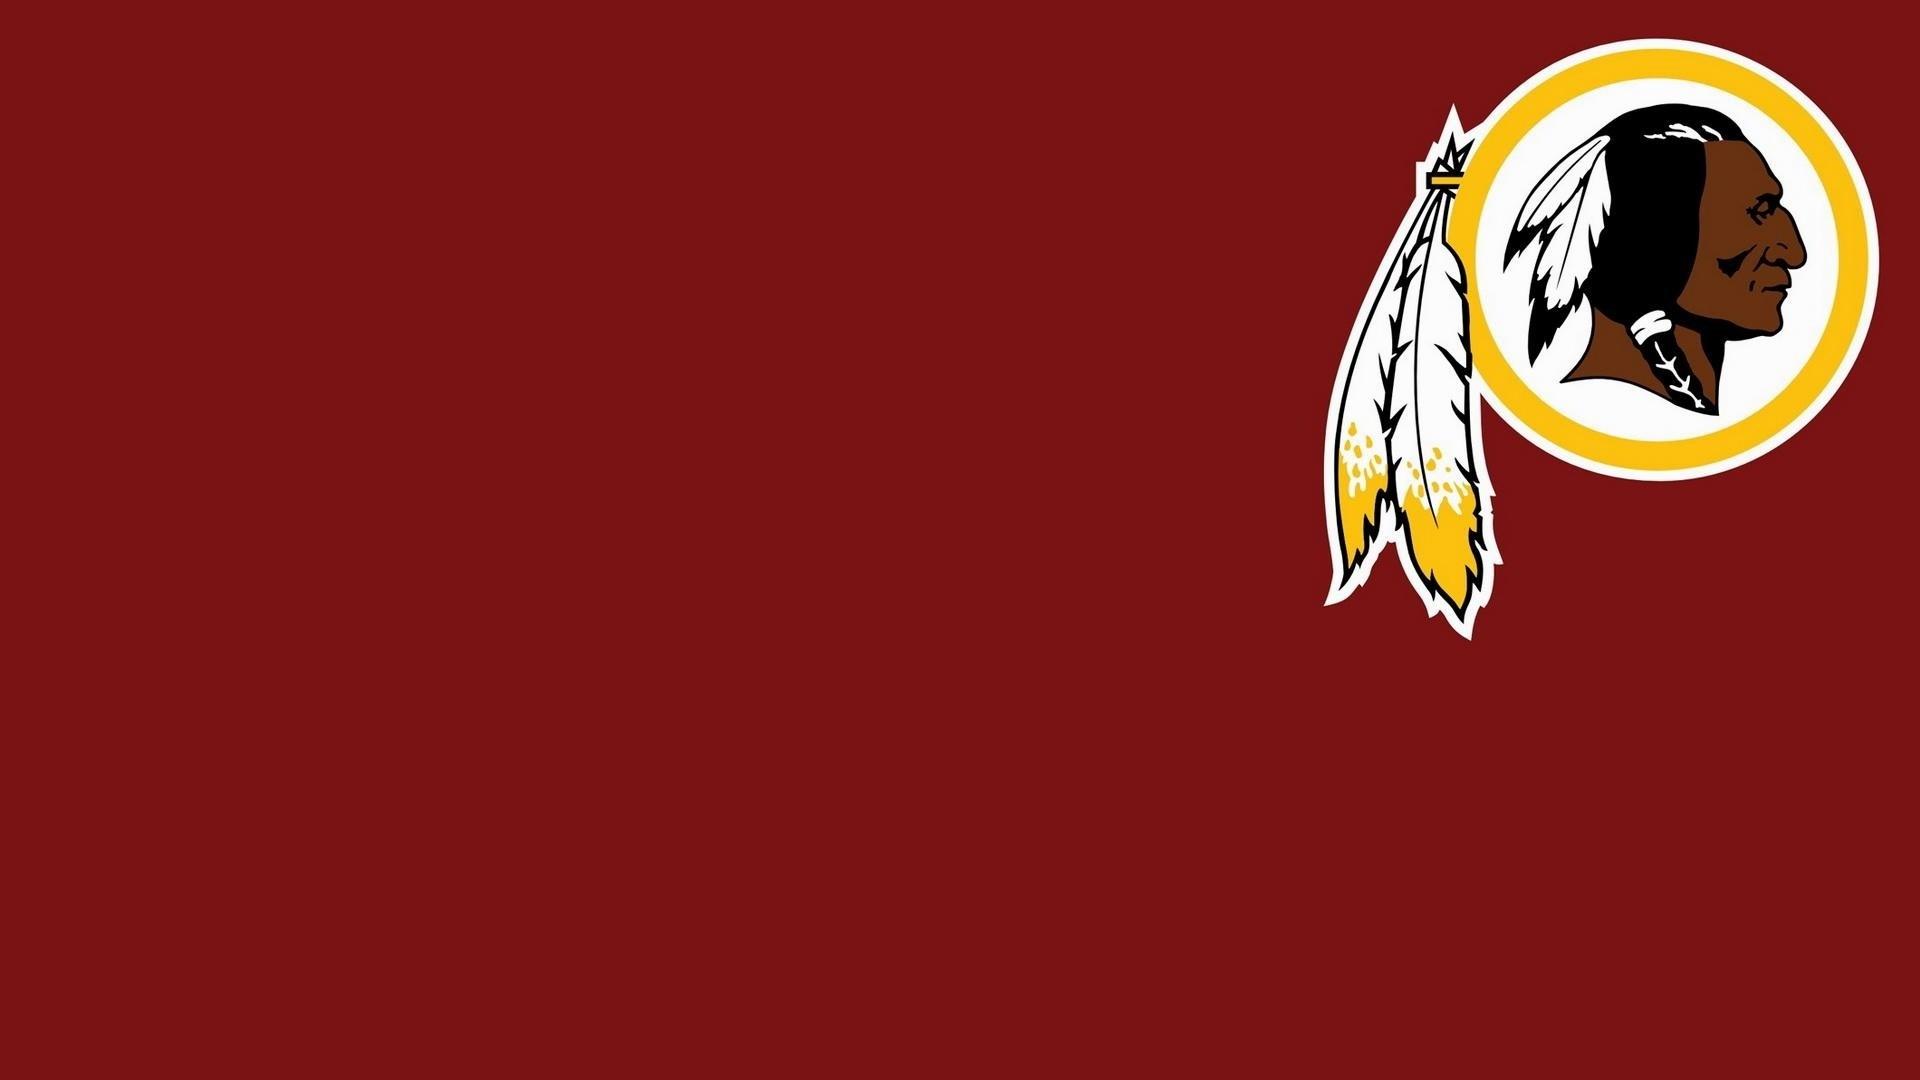 Redskins High Quality